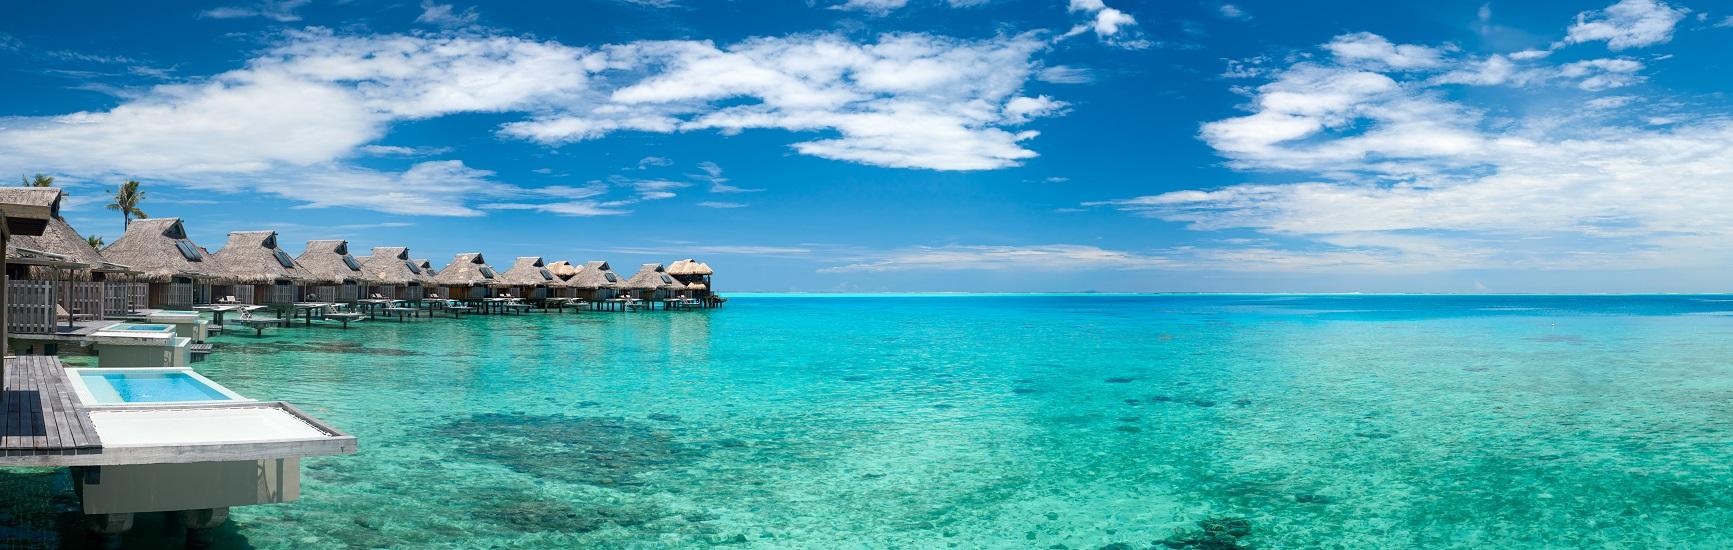 https://tahititourisme.kr/wp-content/uploads/2017/09/HERBERGEMENT-Conrad-Bora-Bora-Nui-3.jpg